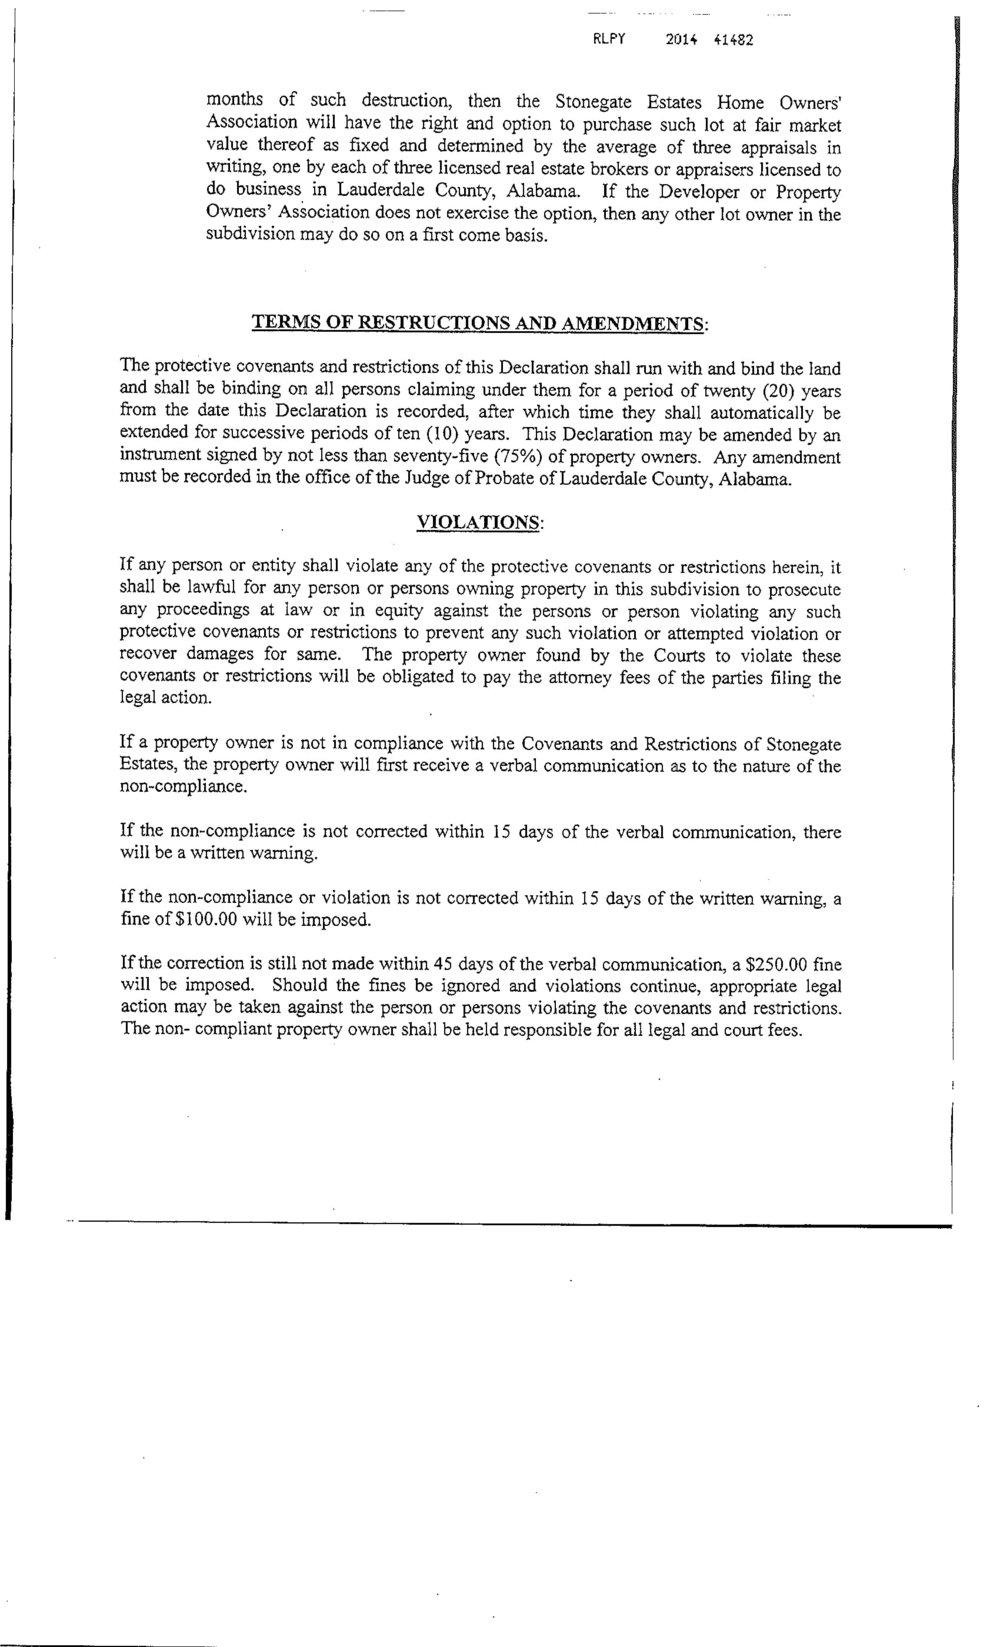 Covenants-Stonegate-Estates1-07.jpg